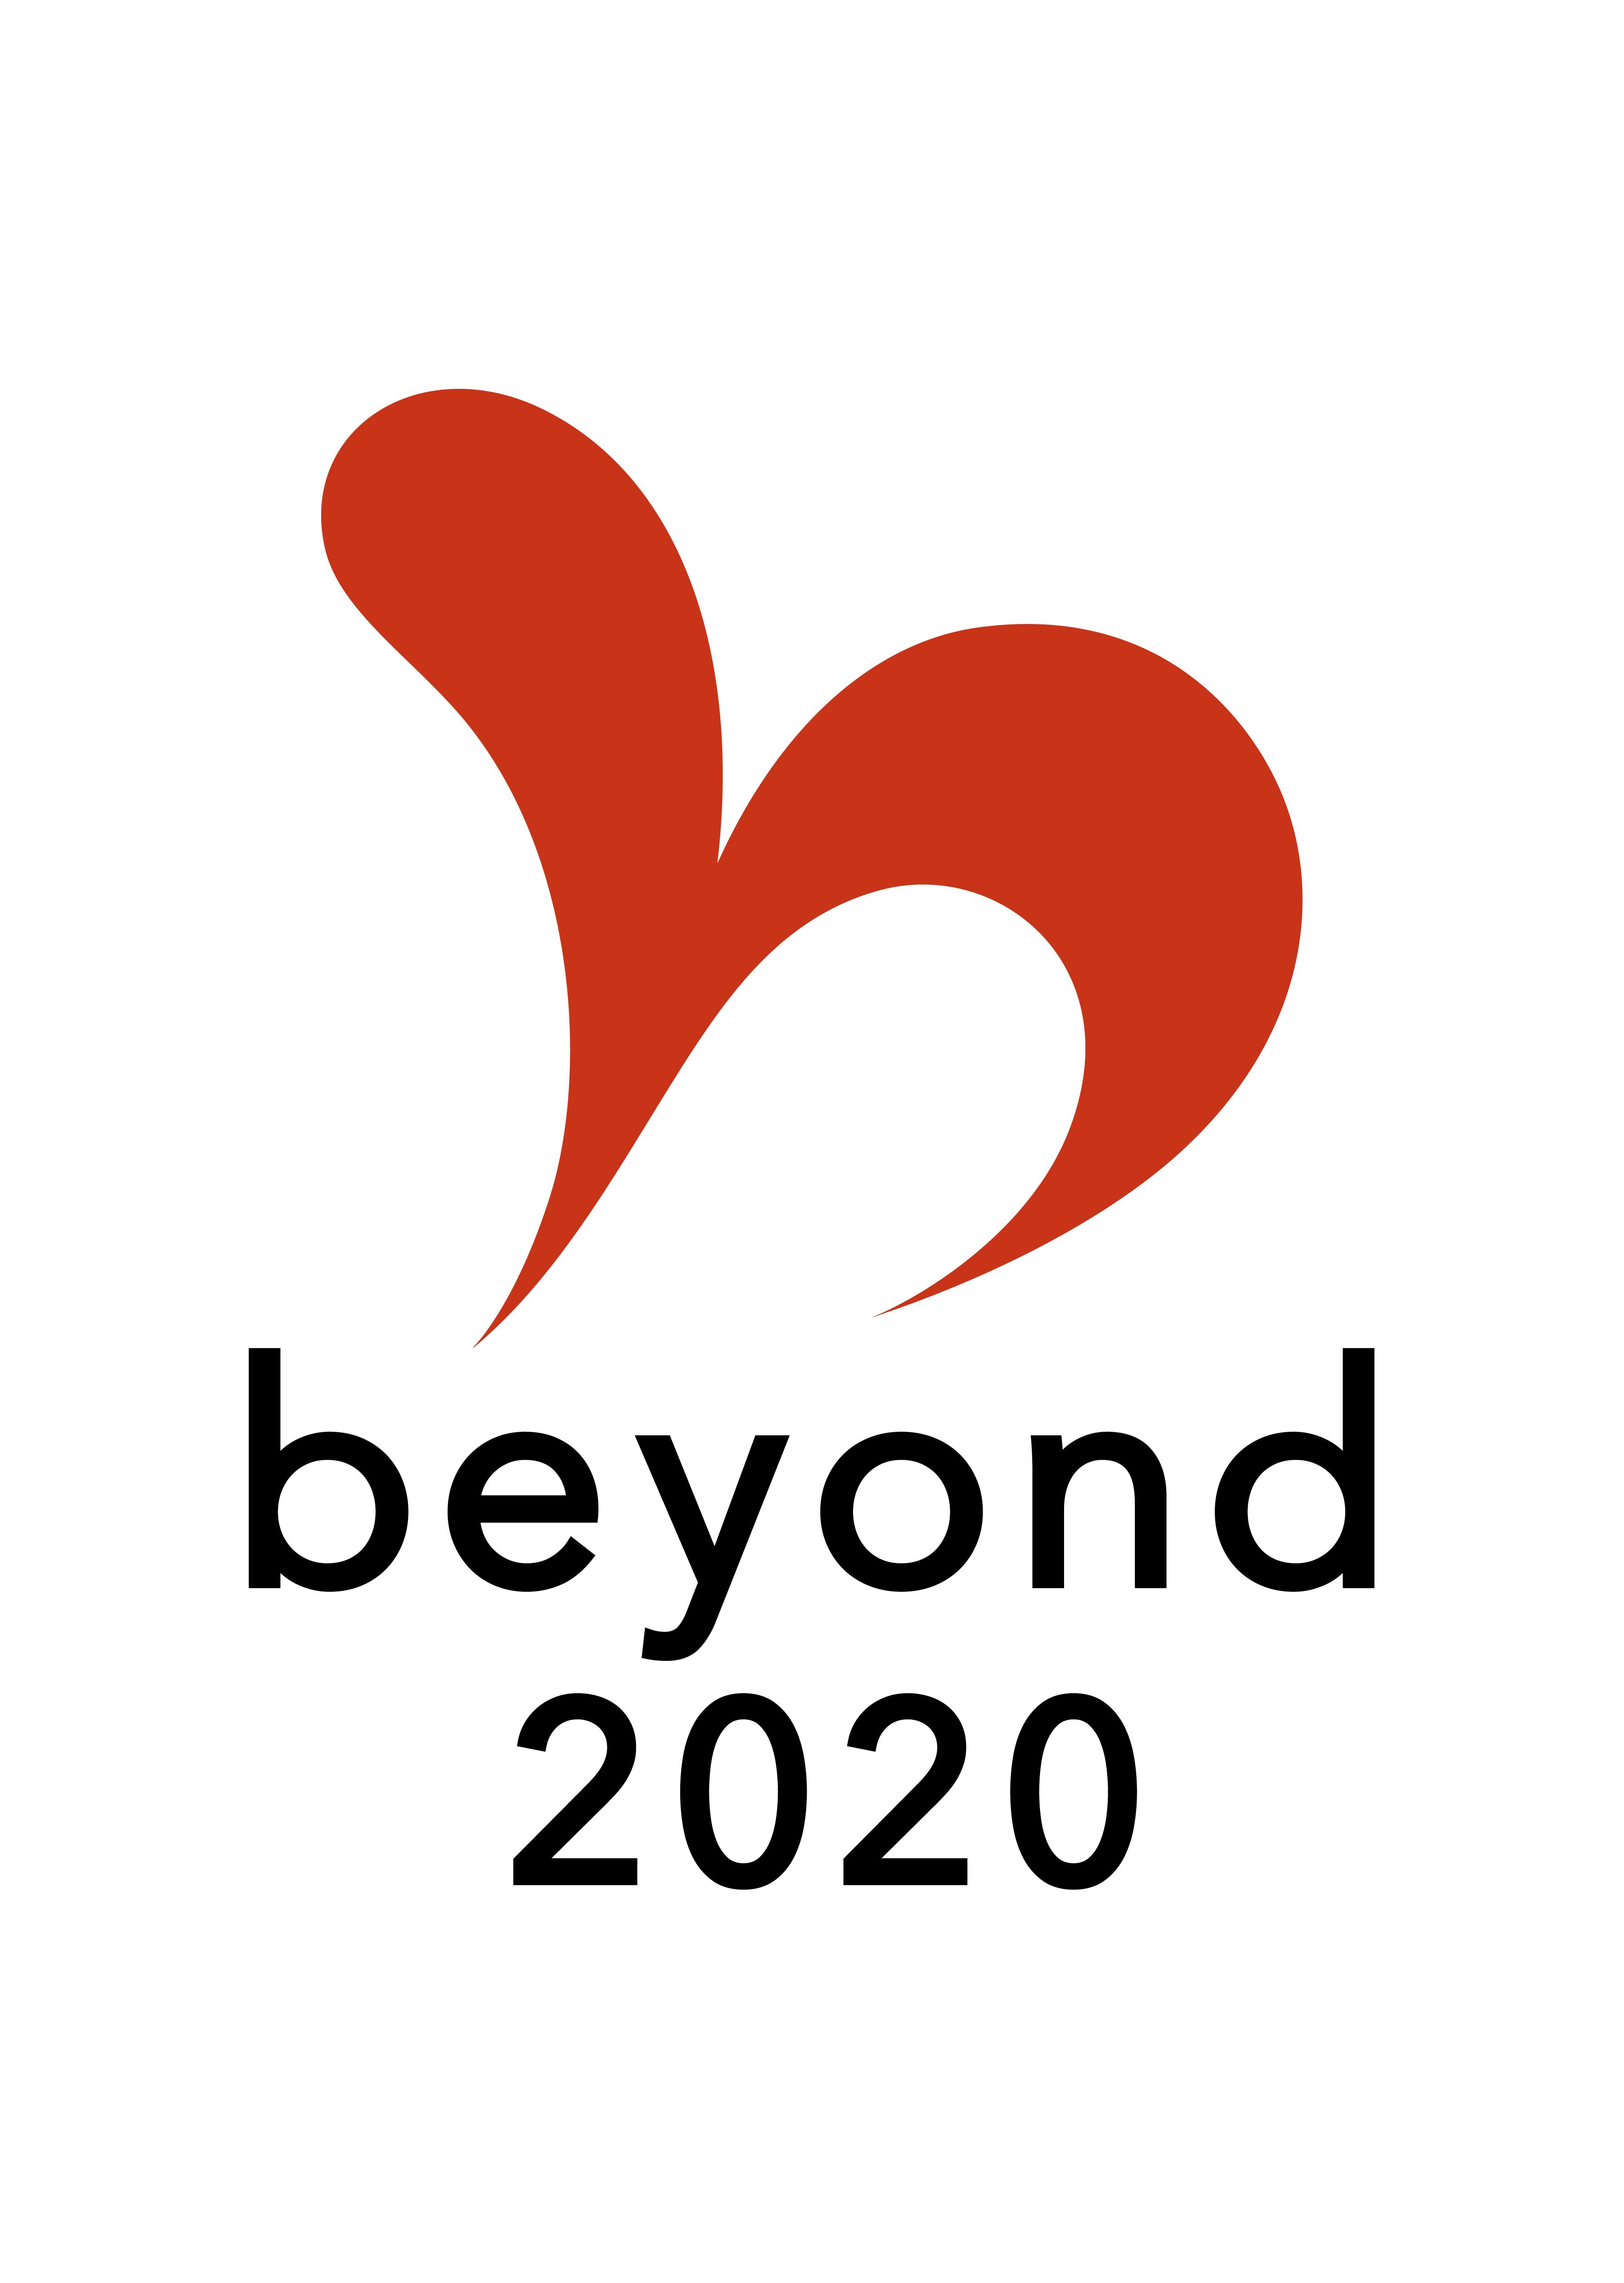 beyond2020_logo_170608.jpg